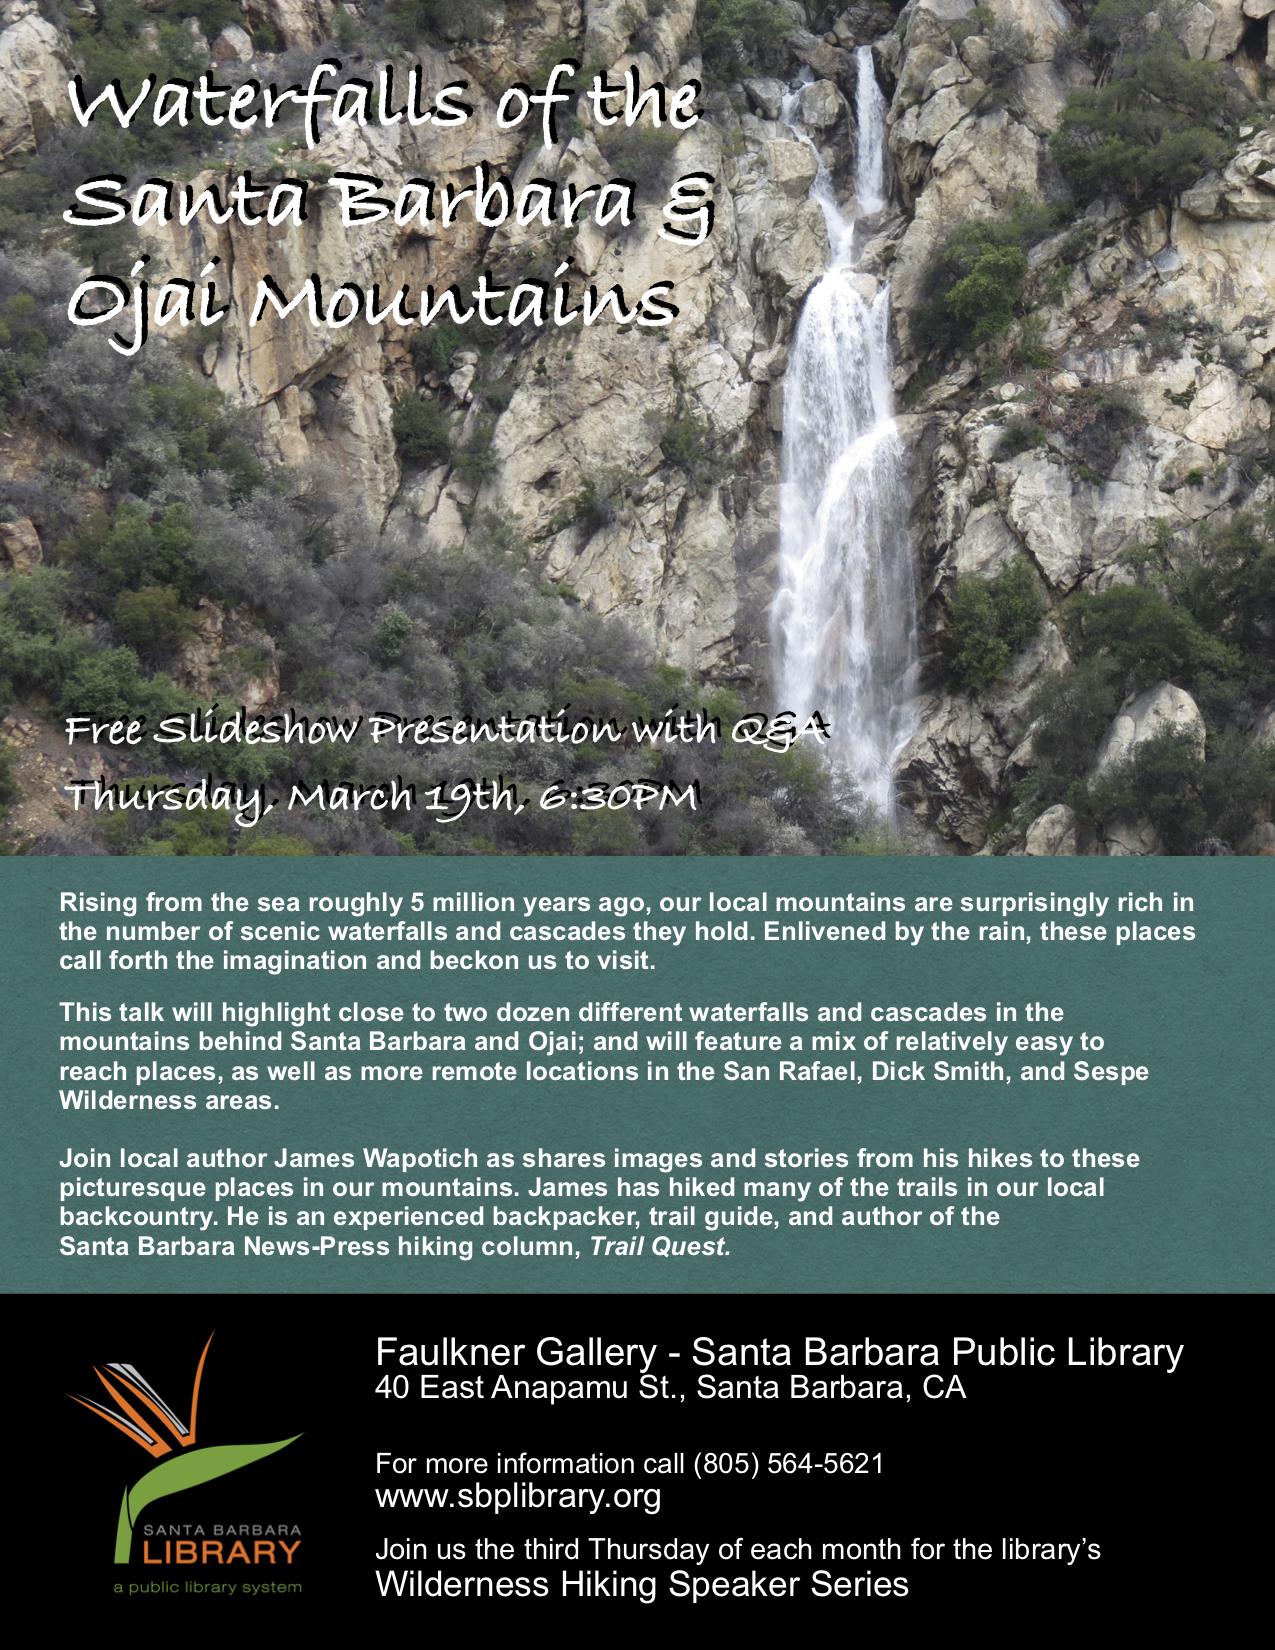 Waterfalls Cascades Santa Barbara Ojai Santa Ynez Mountains San Rafael Wilderness Dick Smith Sespe hike trail los padres national forest